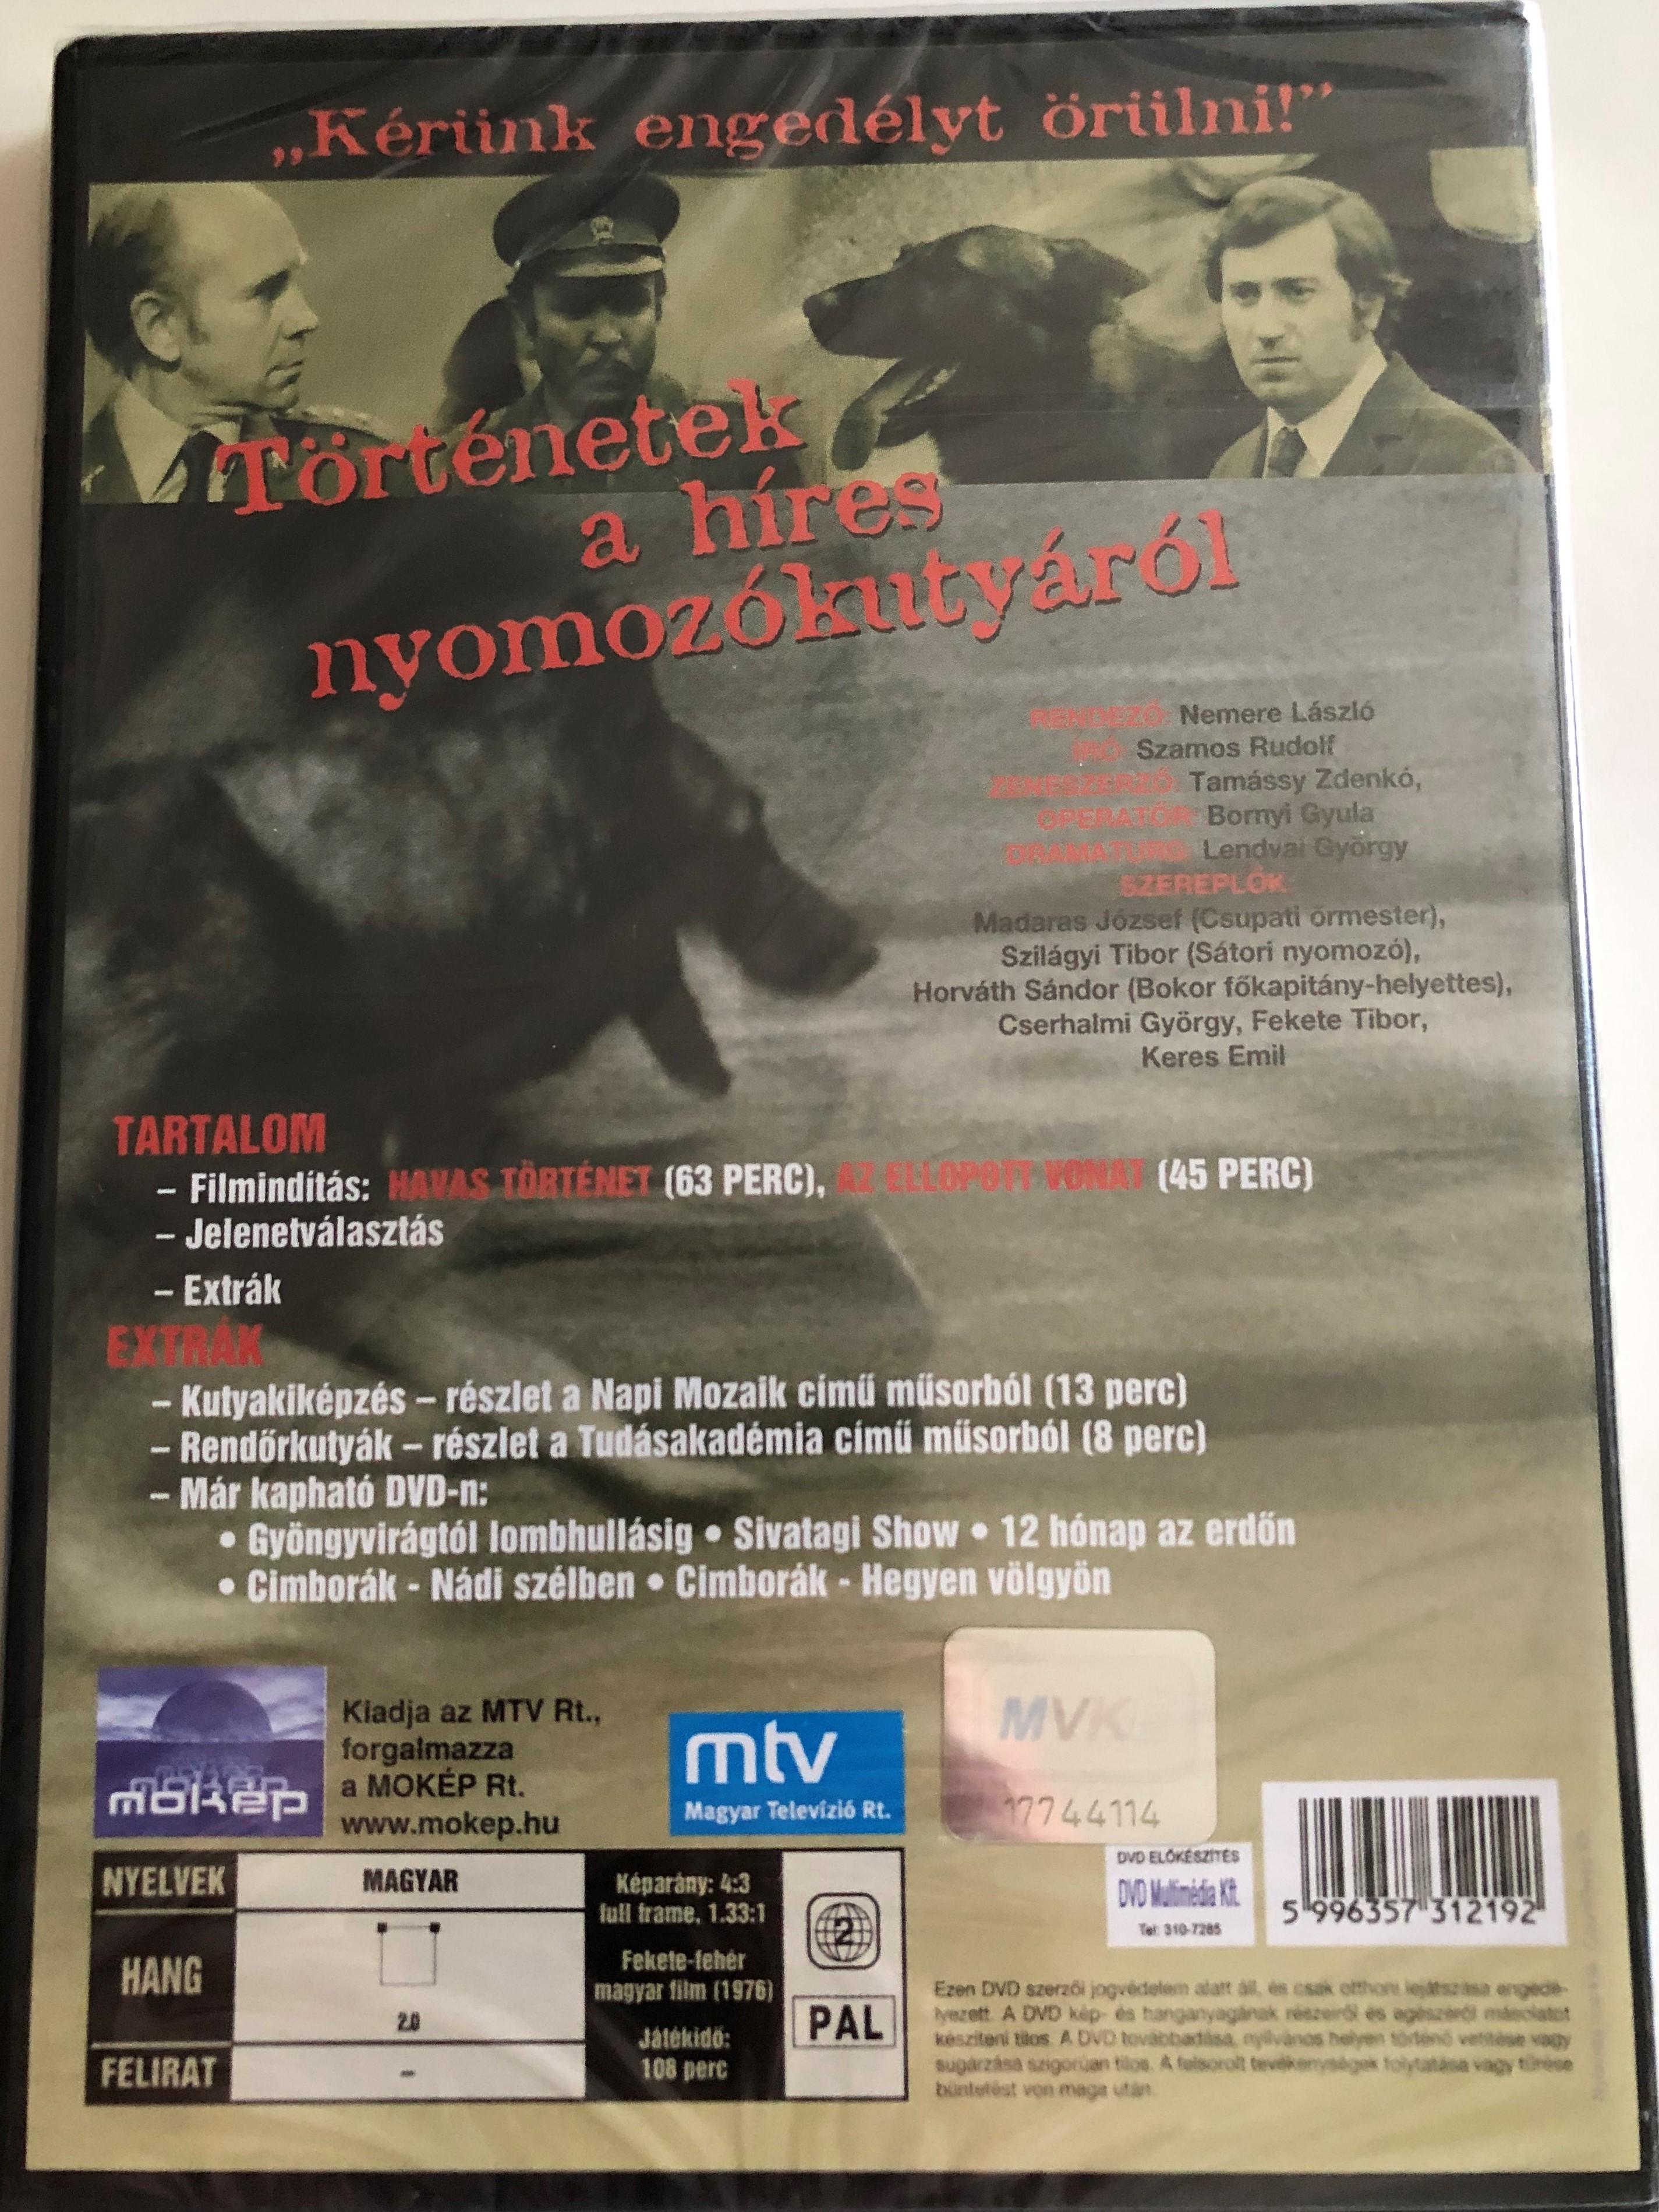 -k-ntor-2.-dvd-1976-directed-by-nemere-l-szl-starring-madaras-j-zsef-szil-gyi-tibor-2-.jpg